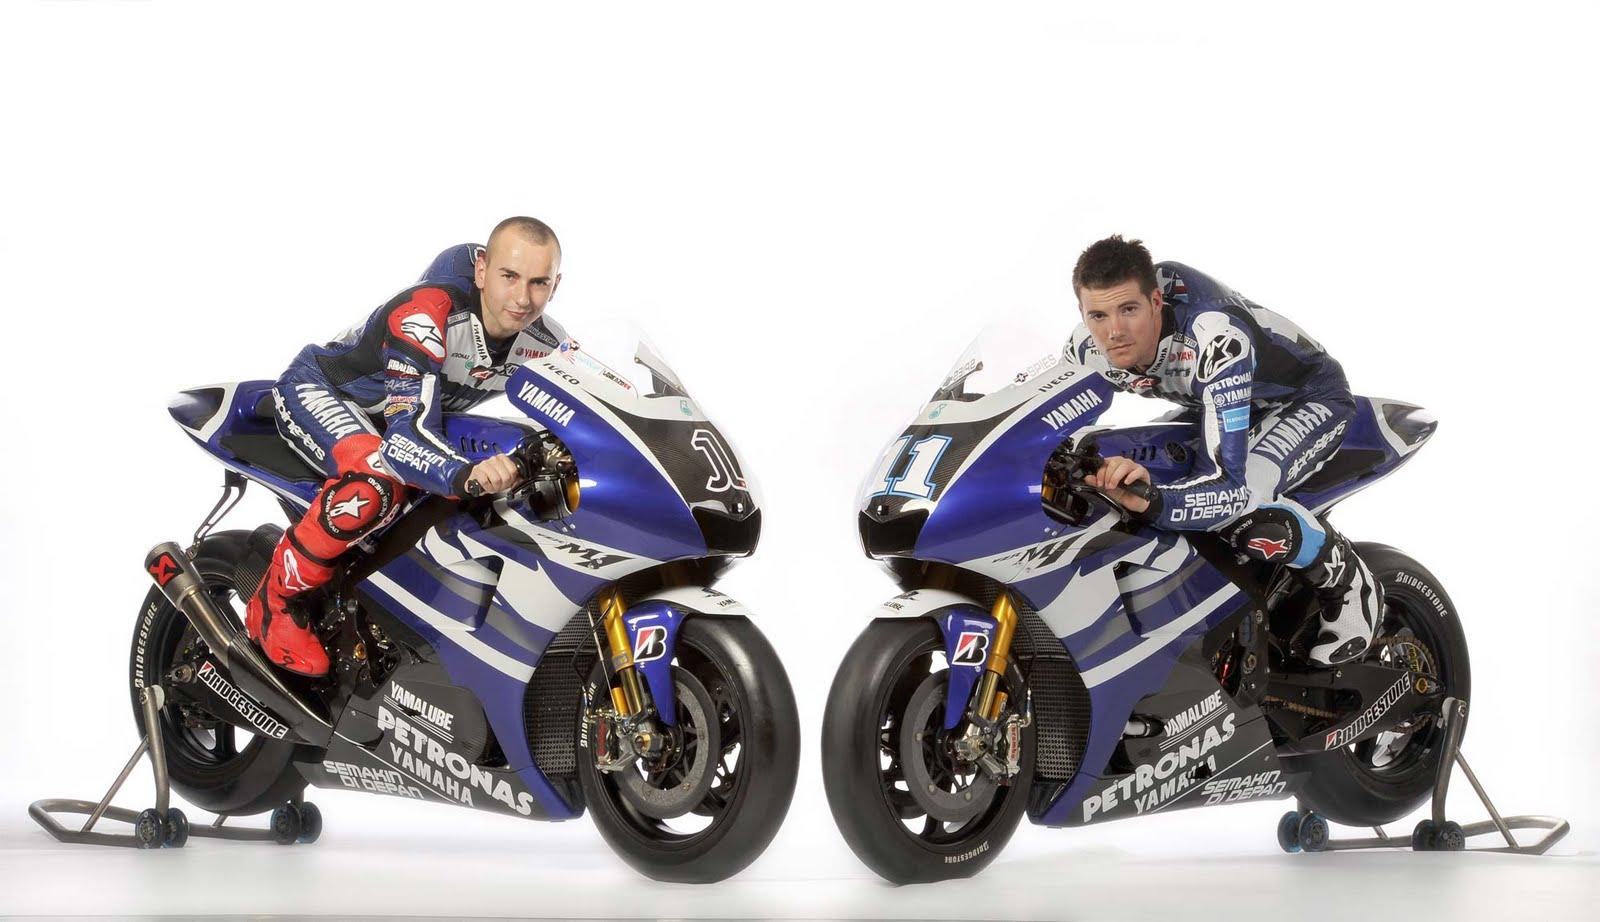 http://4.bp.blogspot.com/-CheA0_2EBC8/ThQm8PtxZaI/AAAAAAAAA-o/vOhwsc0Ok4U/s1600/Yamaha+YZR-M1+MotoGP+Wallpapers5.jpg